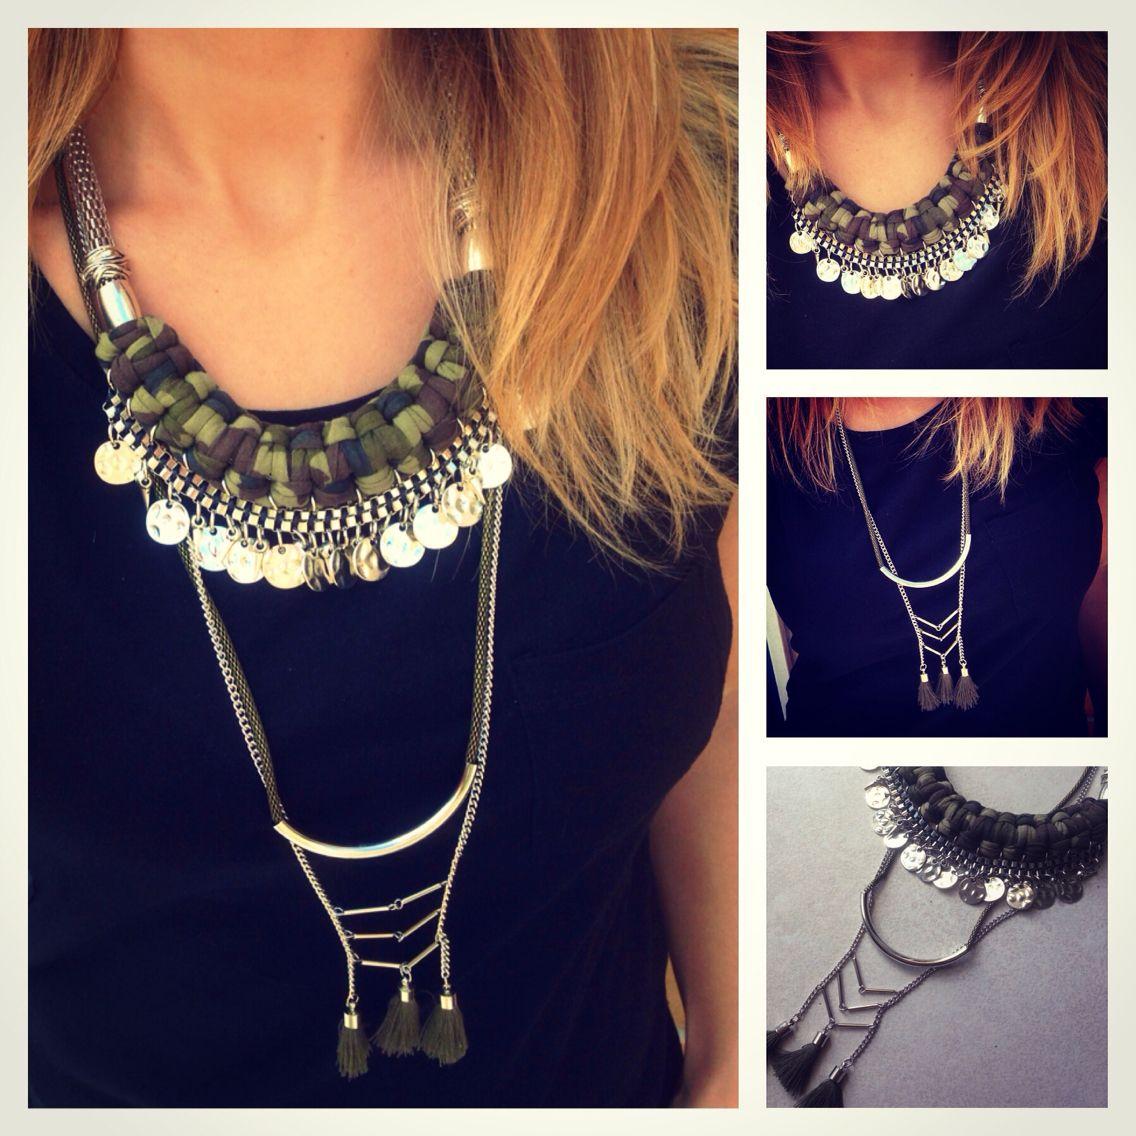 Statement necklace By Cuca #statement #maxicolar #statementnecklace maxicolares statementnecklace